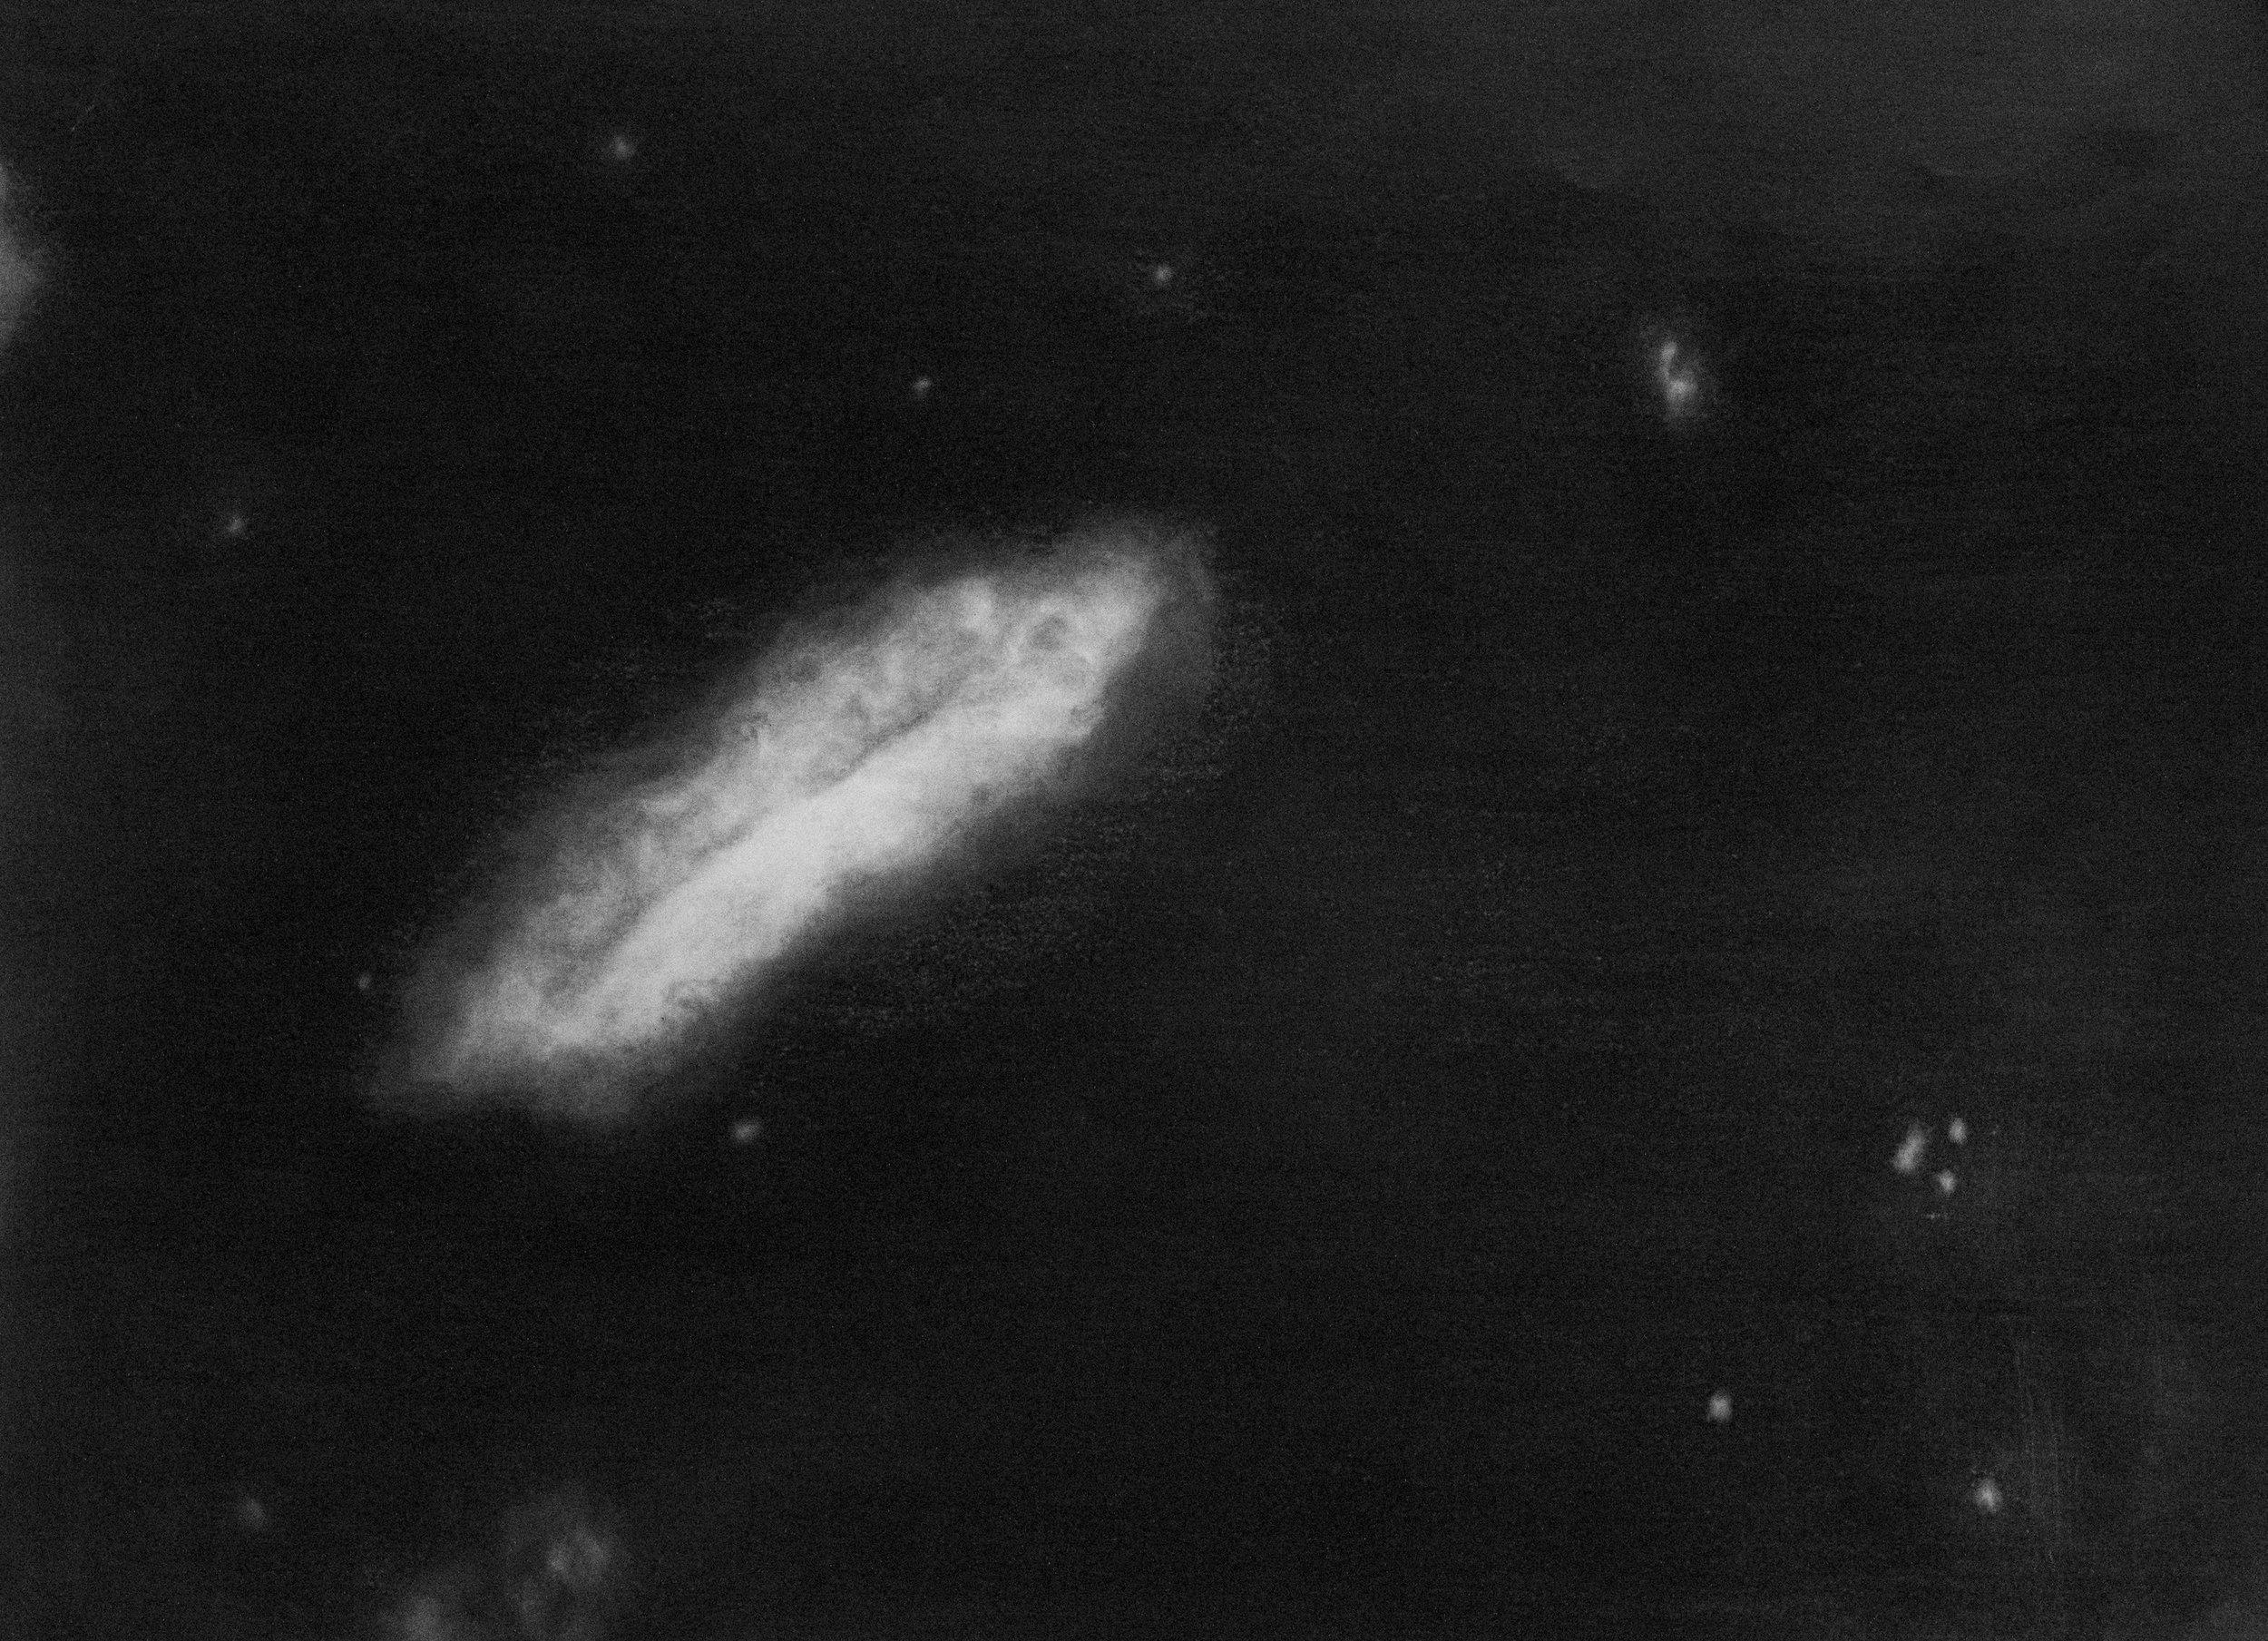 """Las visiones de Caroline Herschel""   Grafito sobre papel   15 de 59,4 x 42 cm ; 18 de 29,7 x 42 cm ; 5 de 25 x 35 cm   2015"